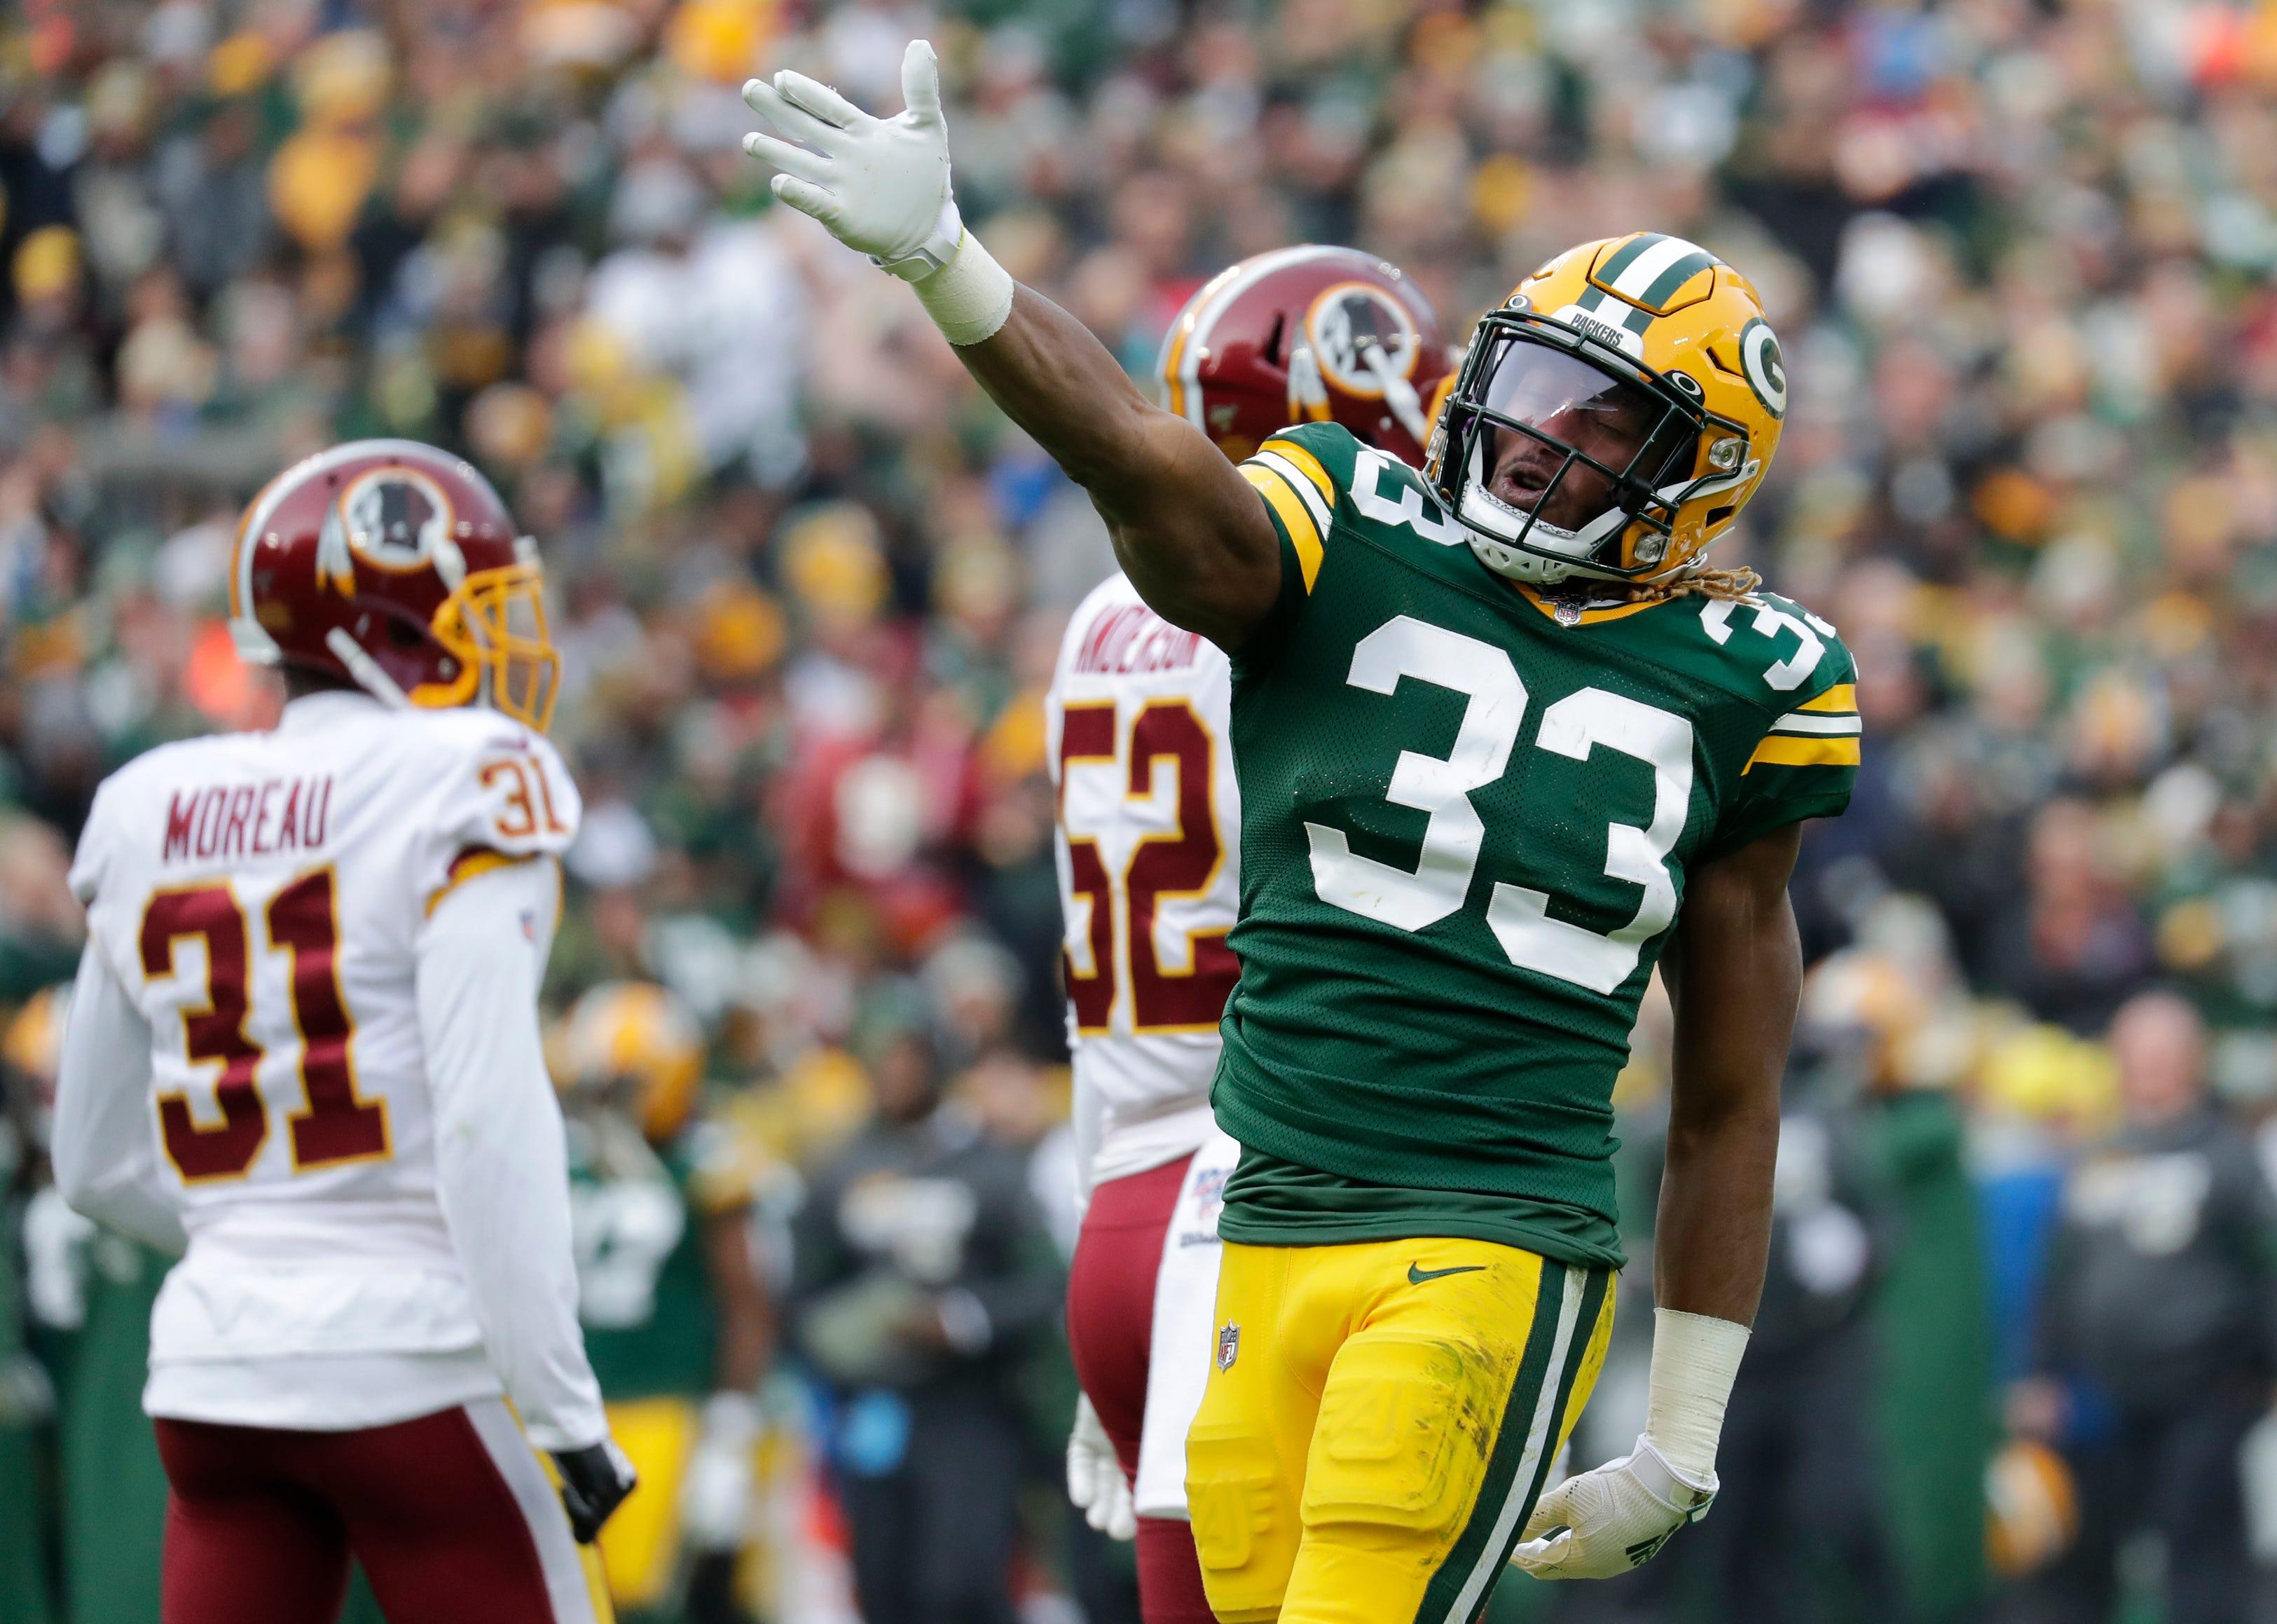 Six Key Factors That Will Determine the Winner of the Packers-Washington Football Team in Week 7